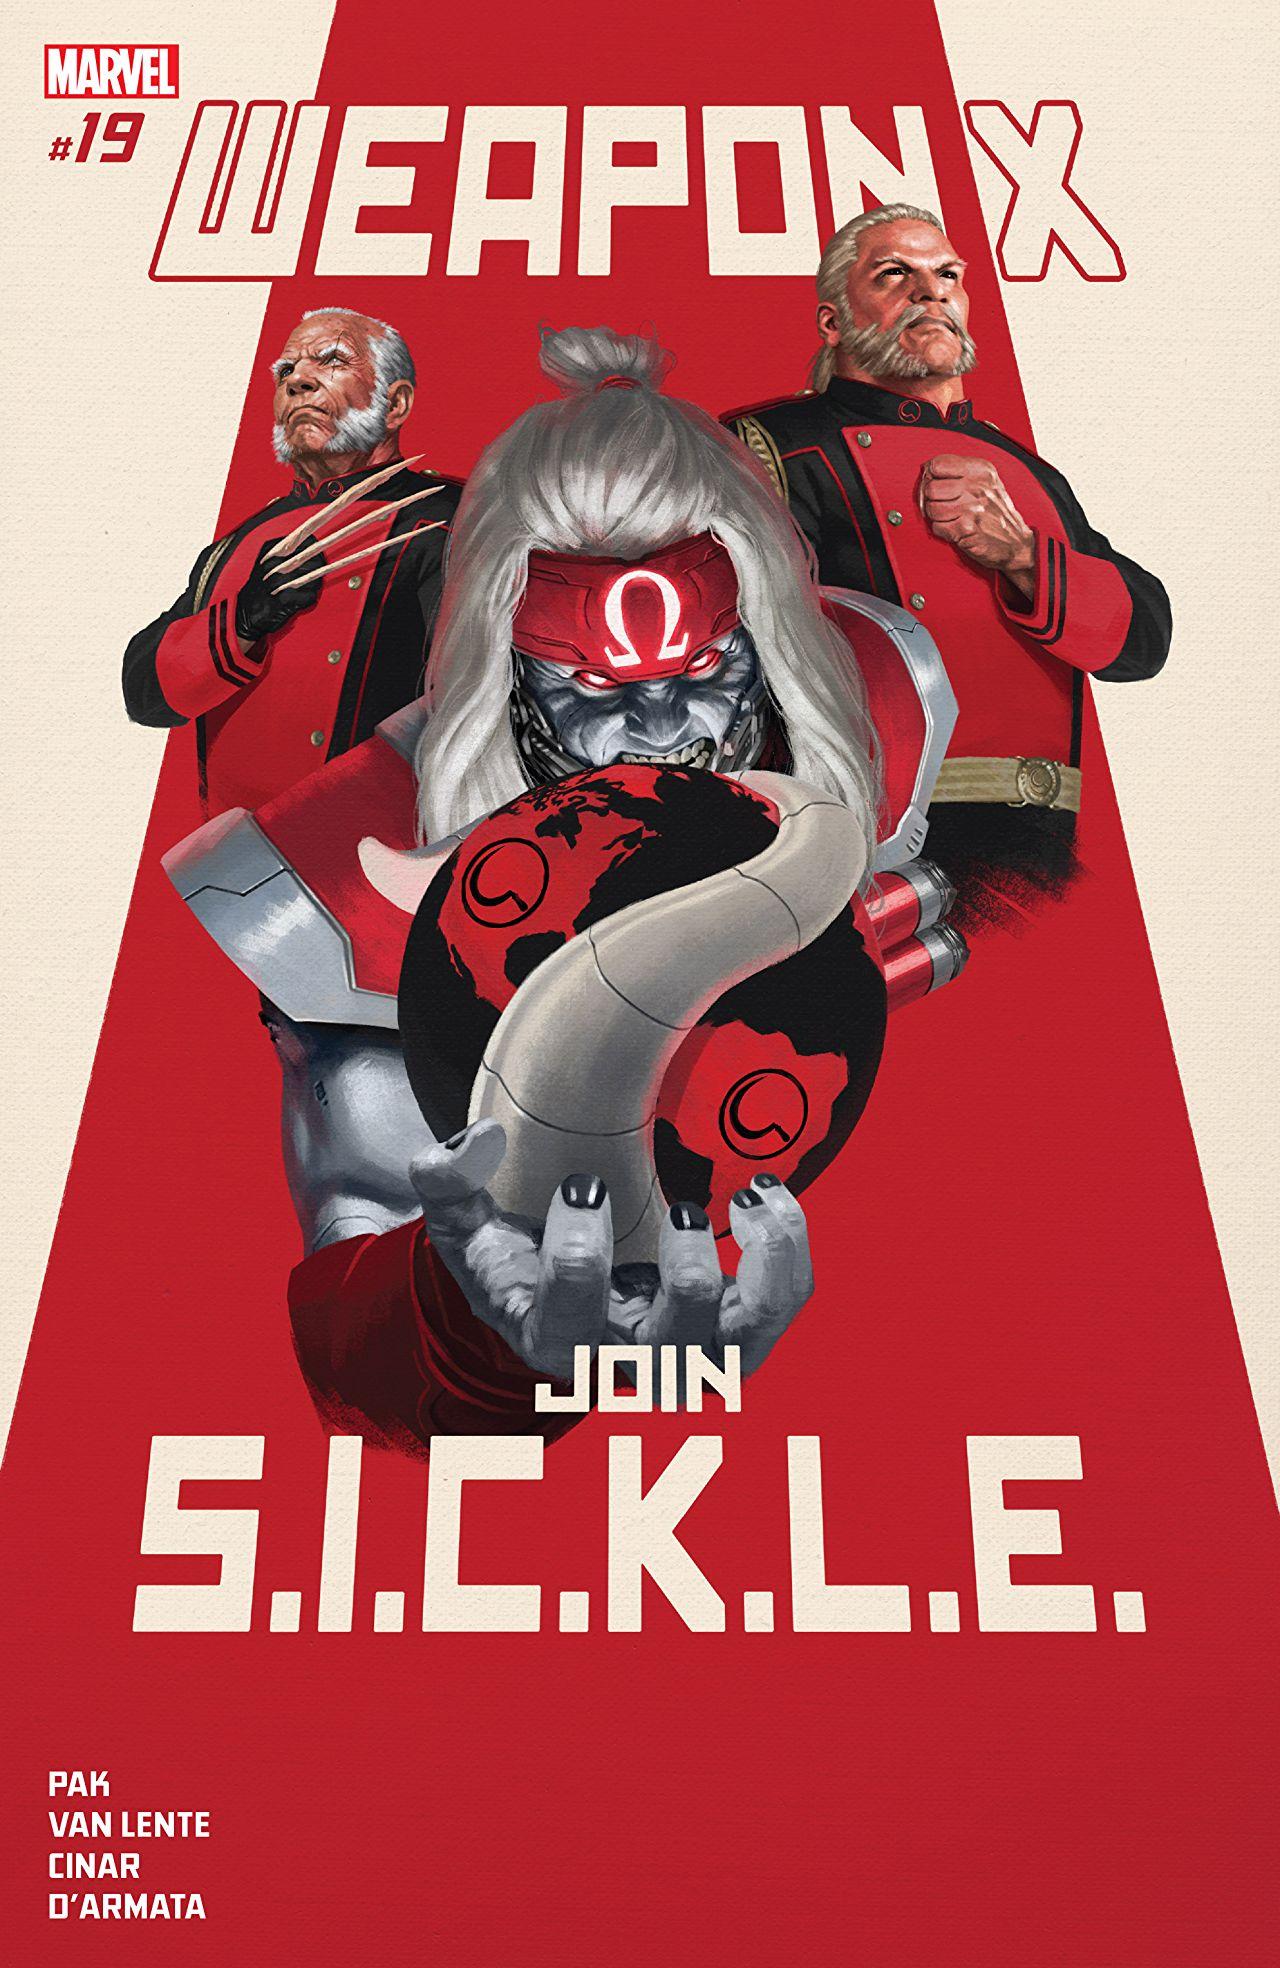 Week's Best Comic Book Covers! | Joseph Mallozzi's Weblog